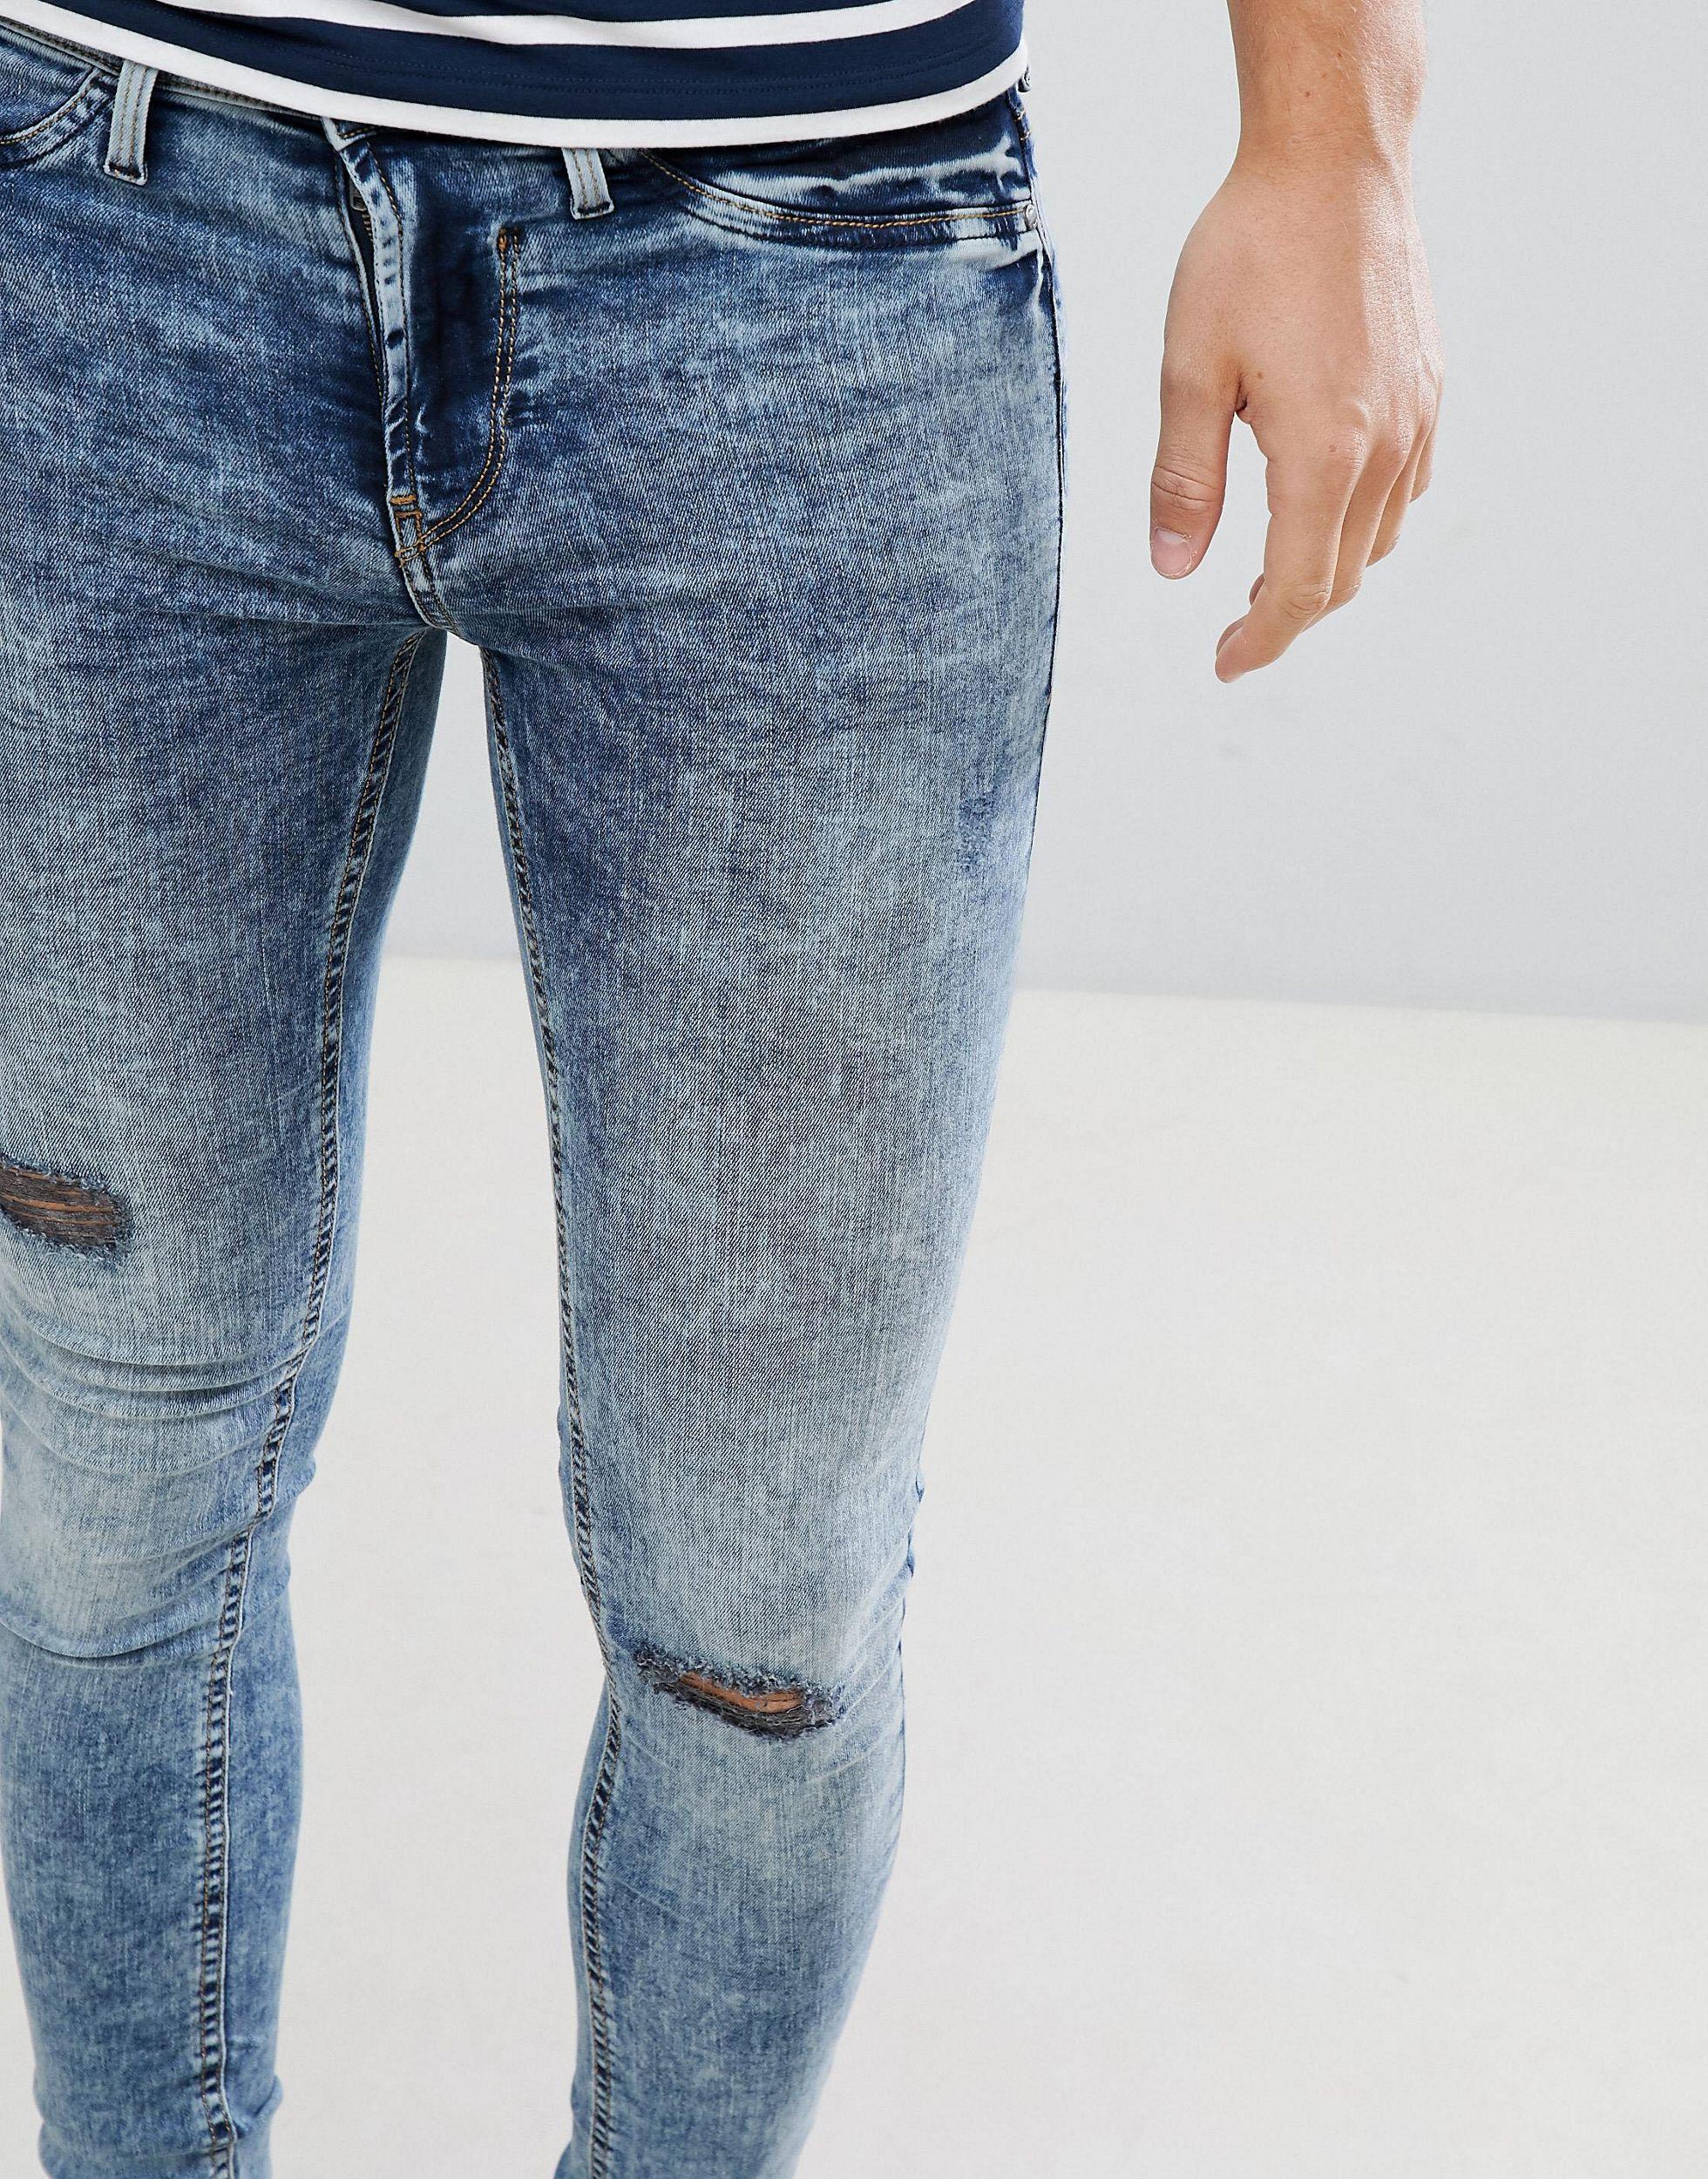 Blend Denim Flurry Muscle Fit Jeans in Blue for Men